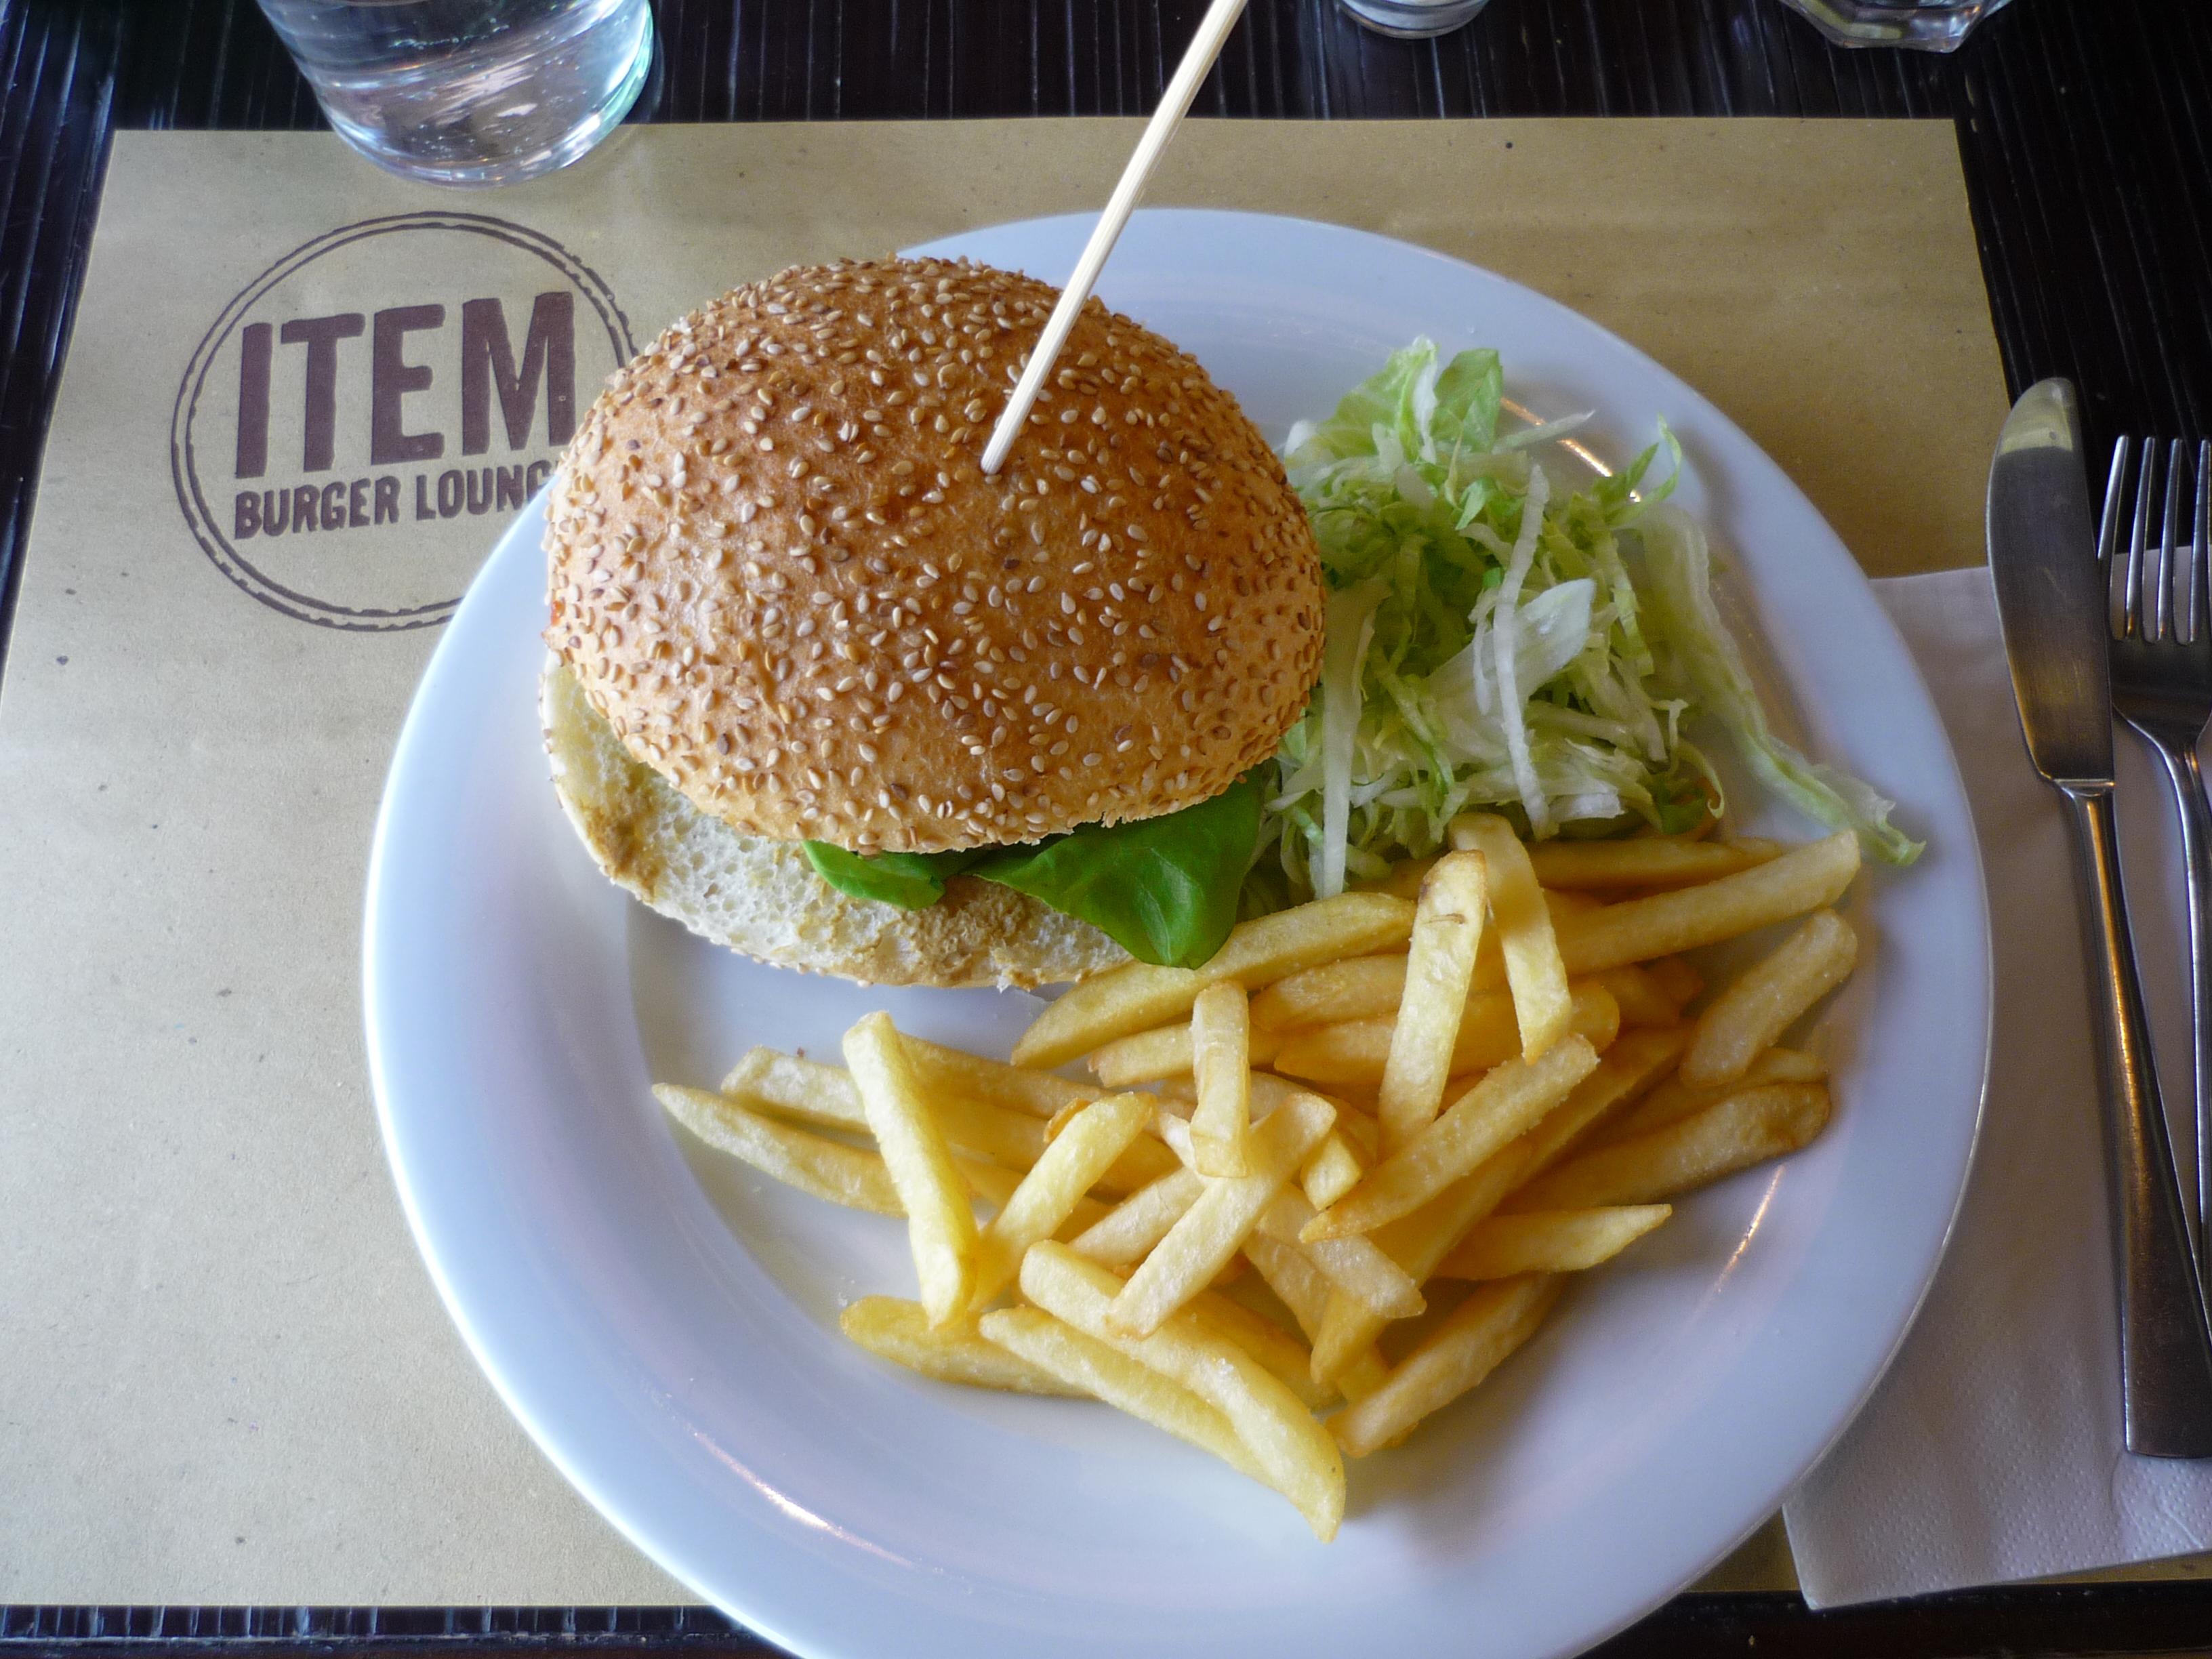 Item - Il panino con l'hamburger